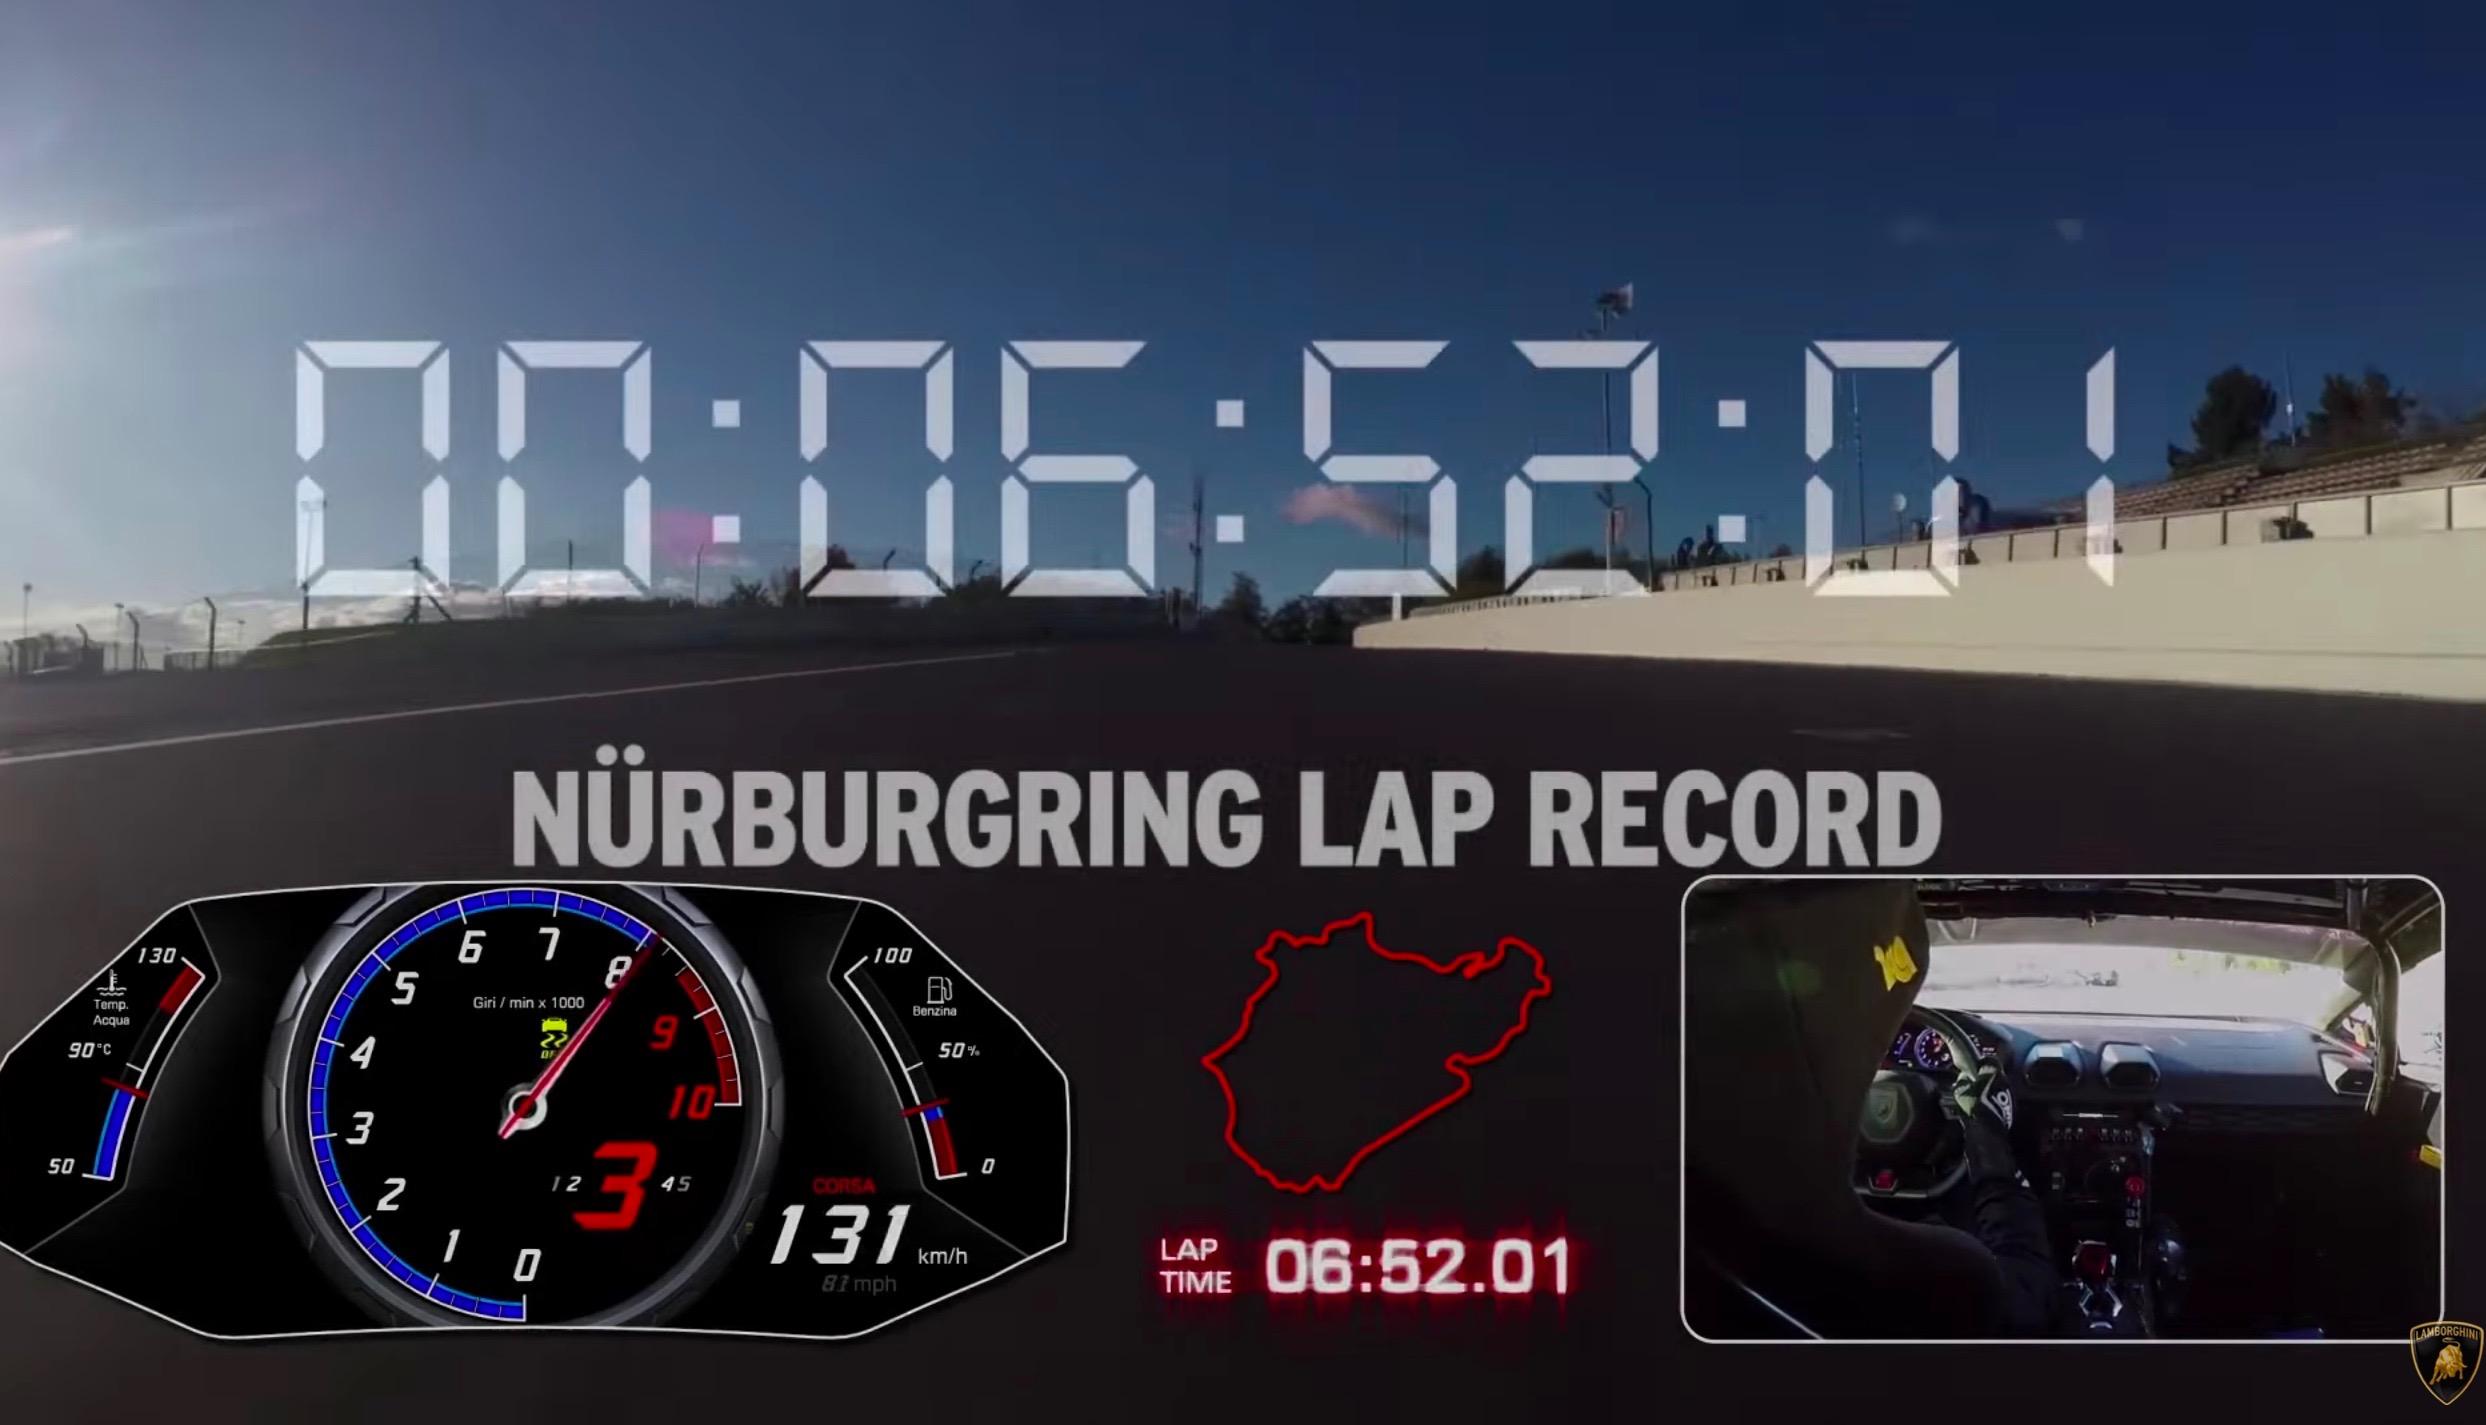 Lamborghini-Huracan-Performante-Nurburgring-record Interesting Porsche 911 Gt2 Rs Nurburgring Lap Cars Trend